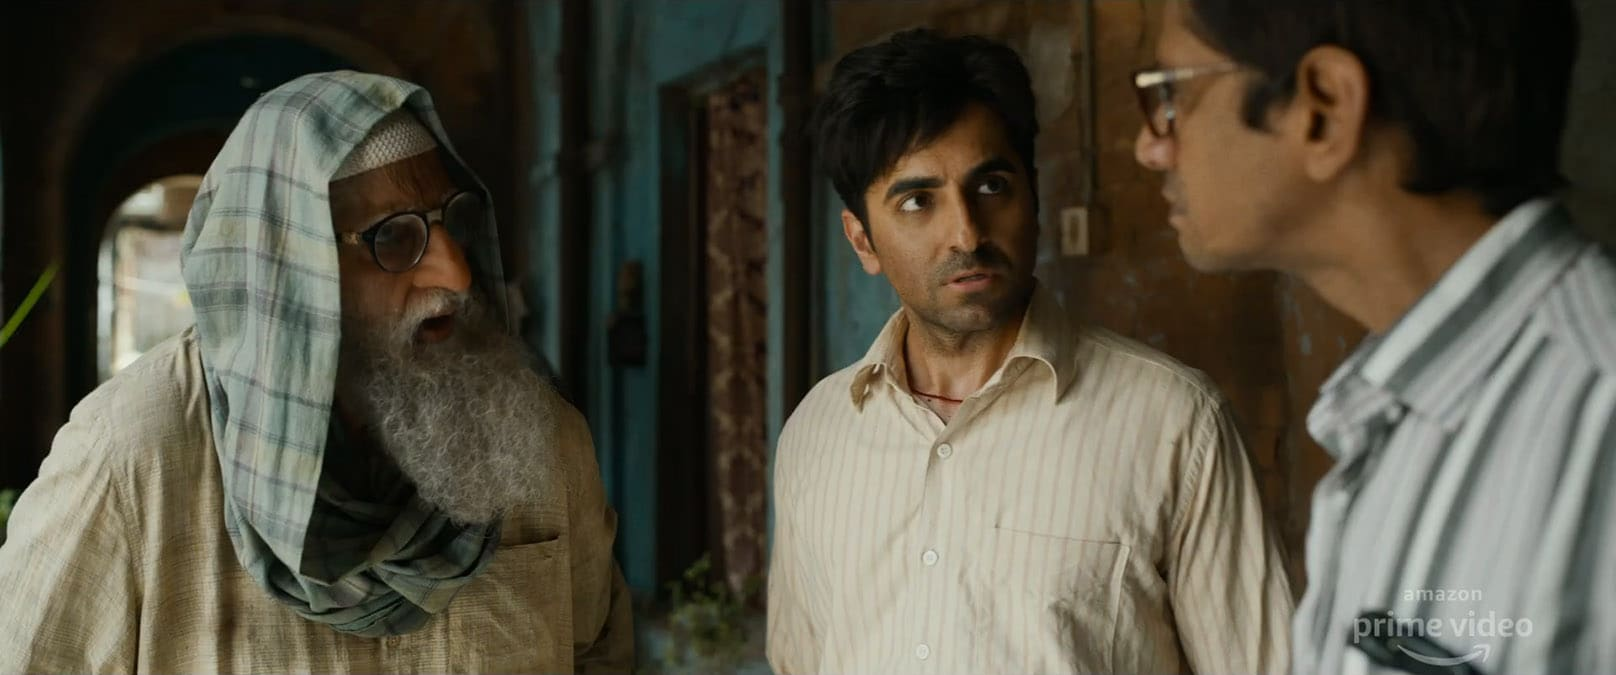 Gulabo Sitabo Trailer: Bachchan, Khurrana at Each Other's Throats in Amazon Movie